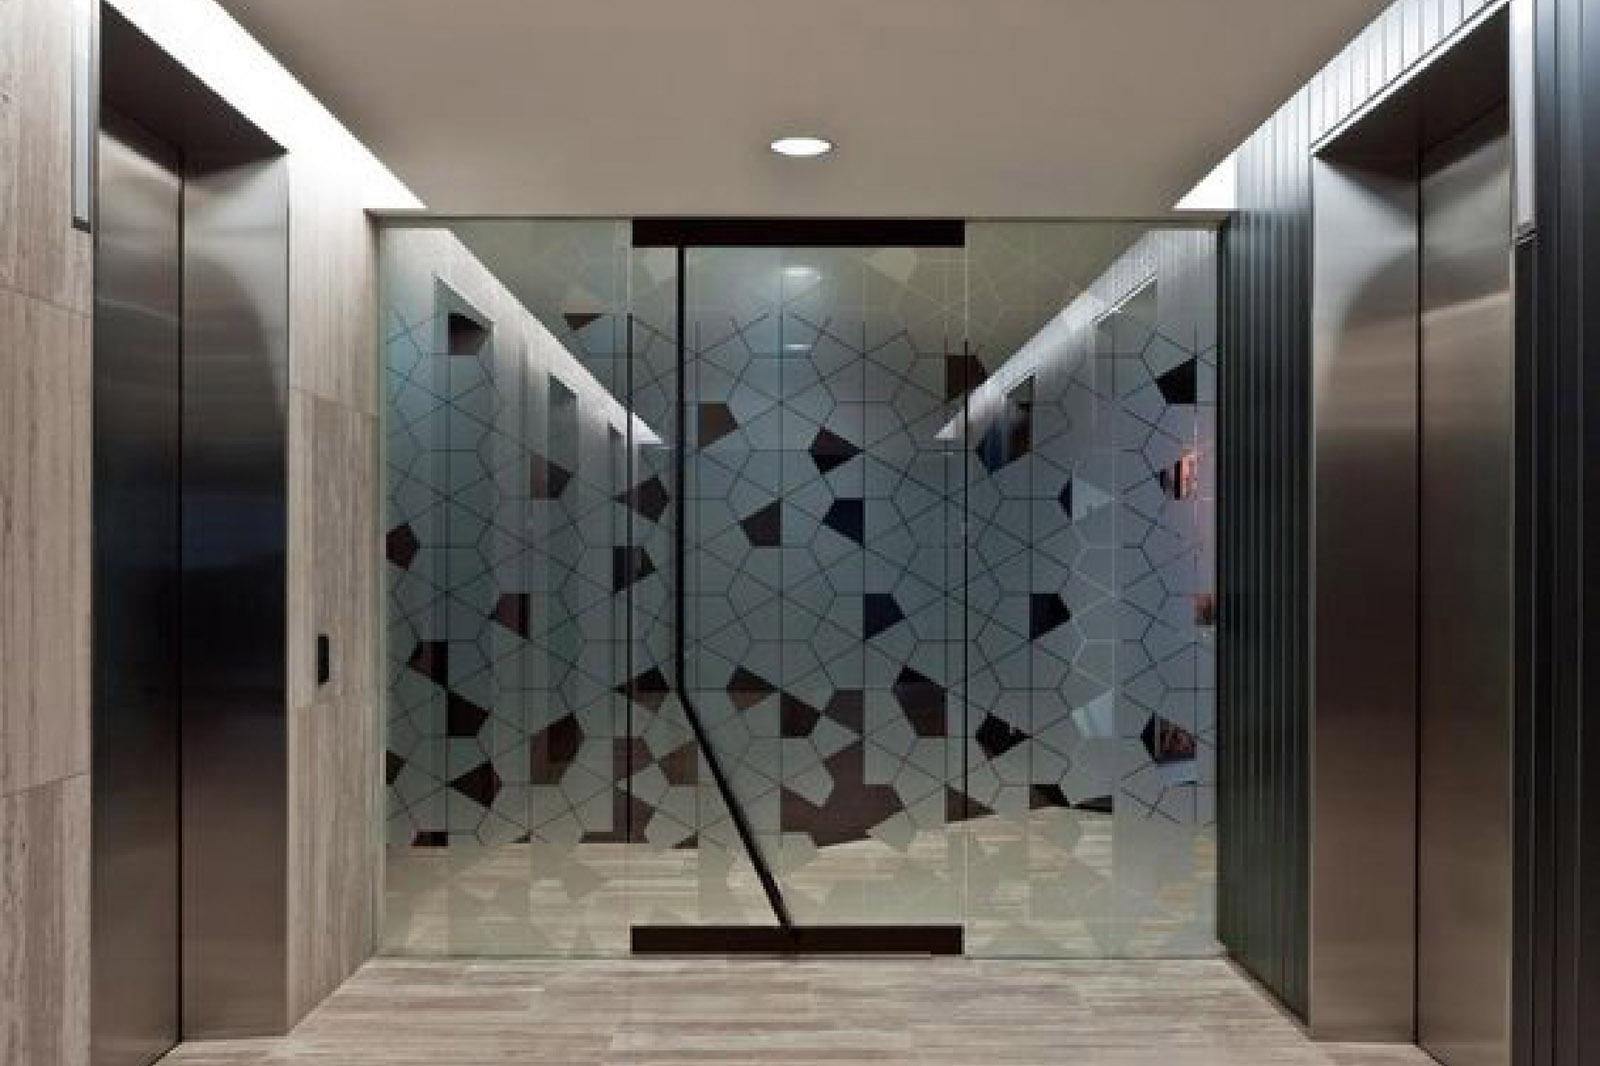 accessoires de confidentialit wall design. Black Bedroom Furniture Sets. Home Design Ideas